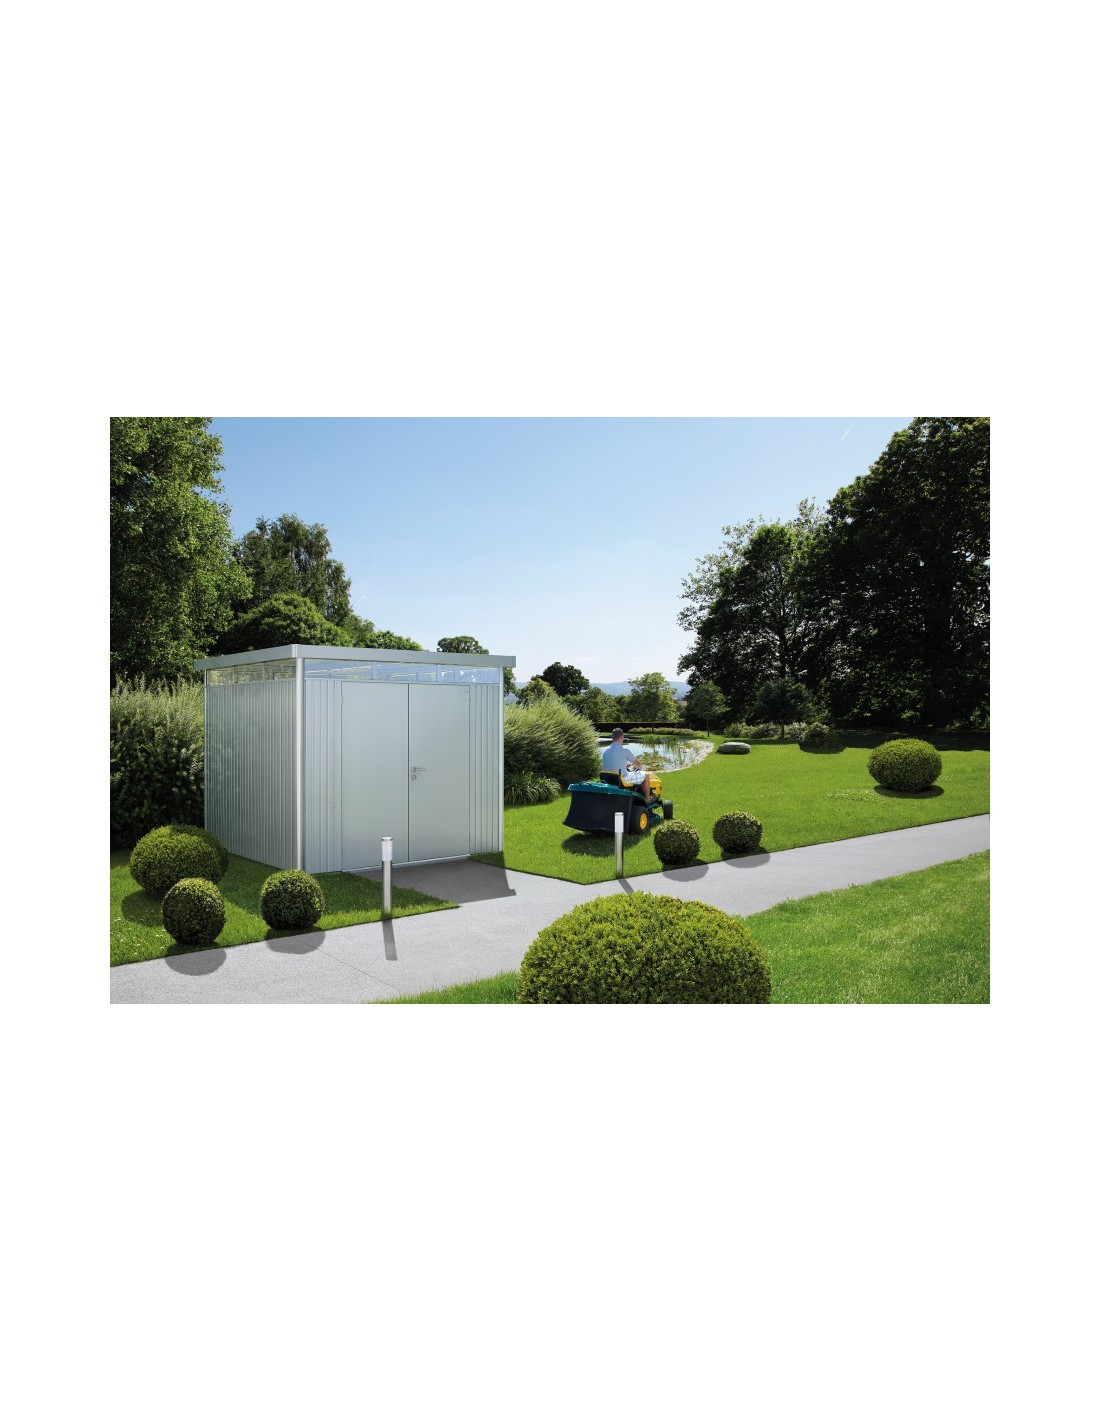 abri de jardin highline biohort double portes de 4 3 8 7 m. Black Bedroom Furniture Sets. Home Design Ideas